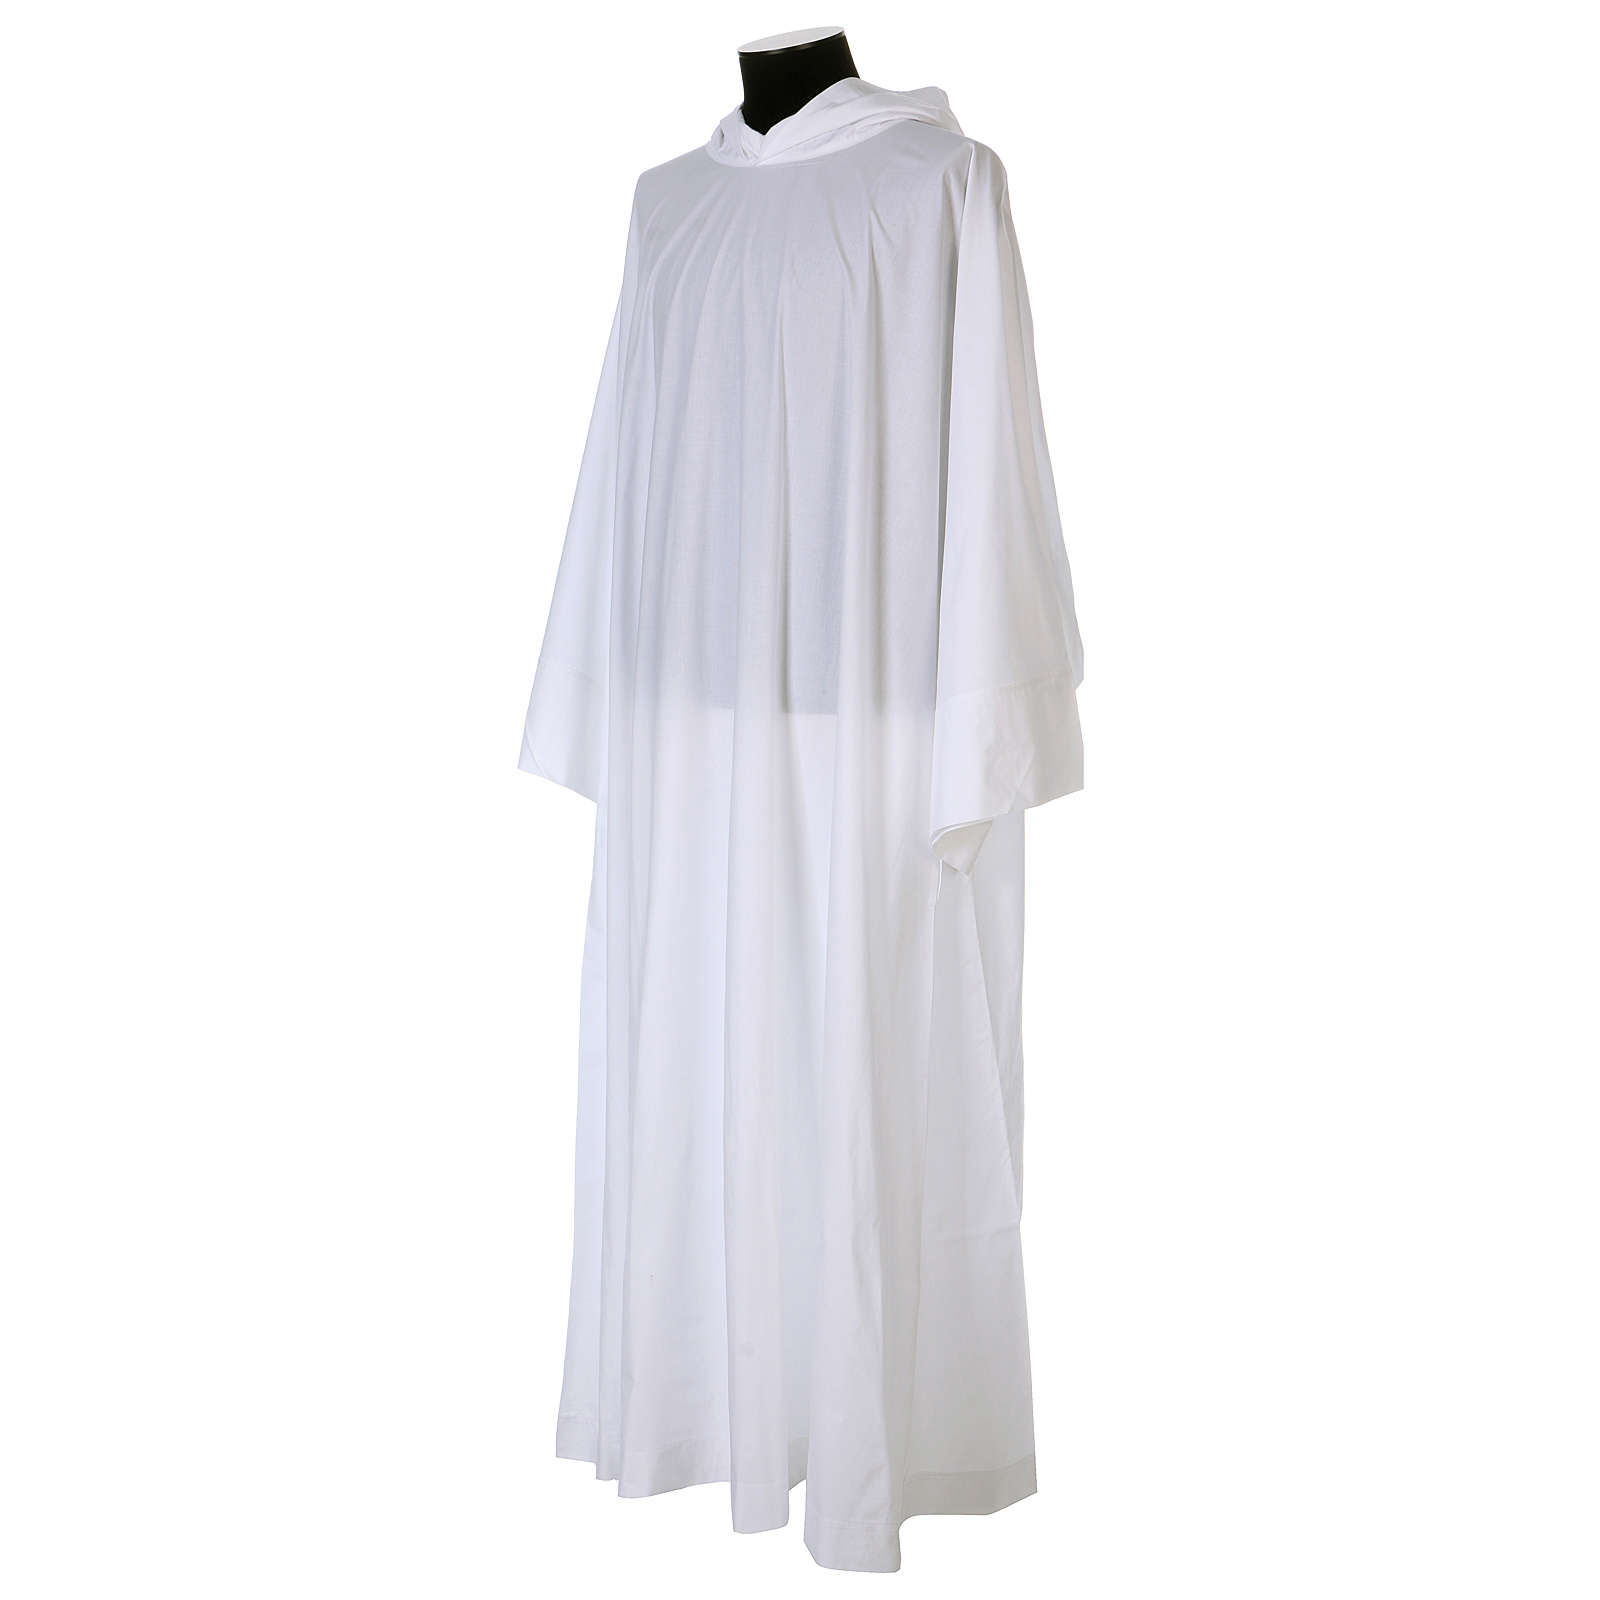 Alba algodón poliéster capucha blanca 4